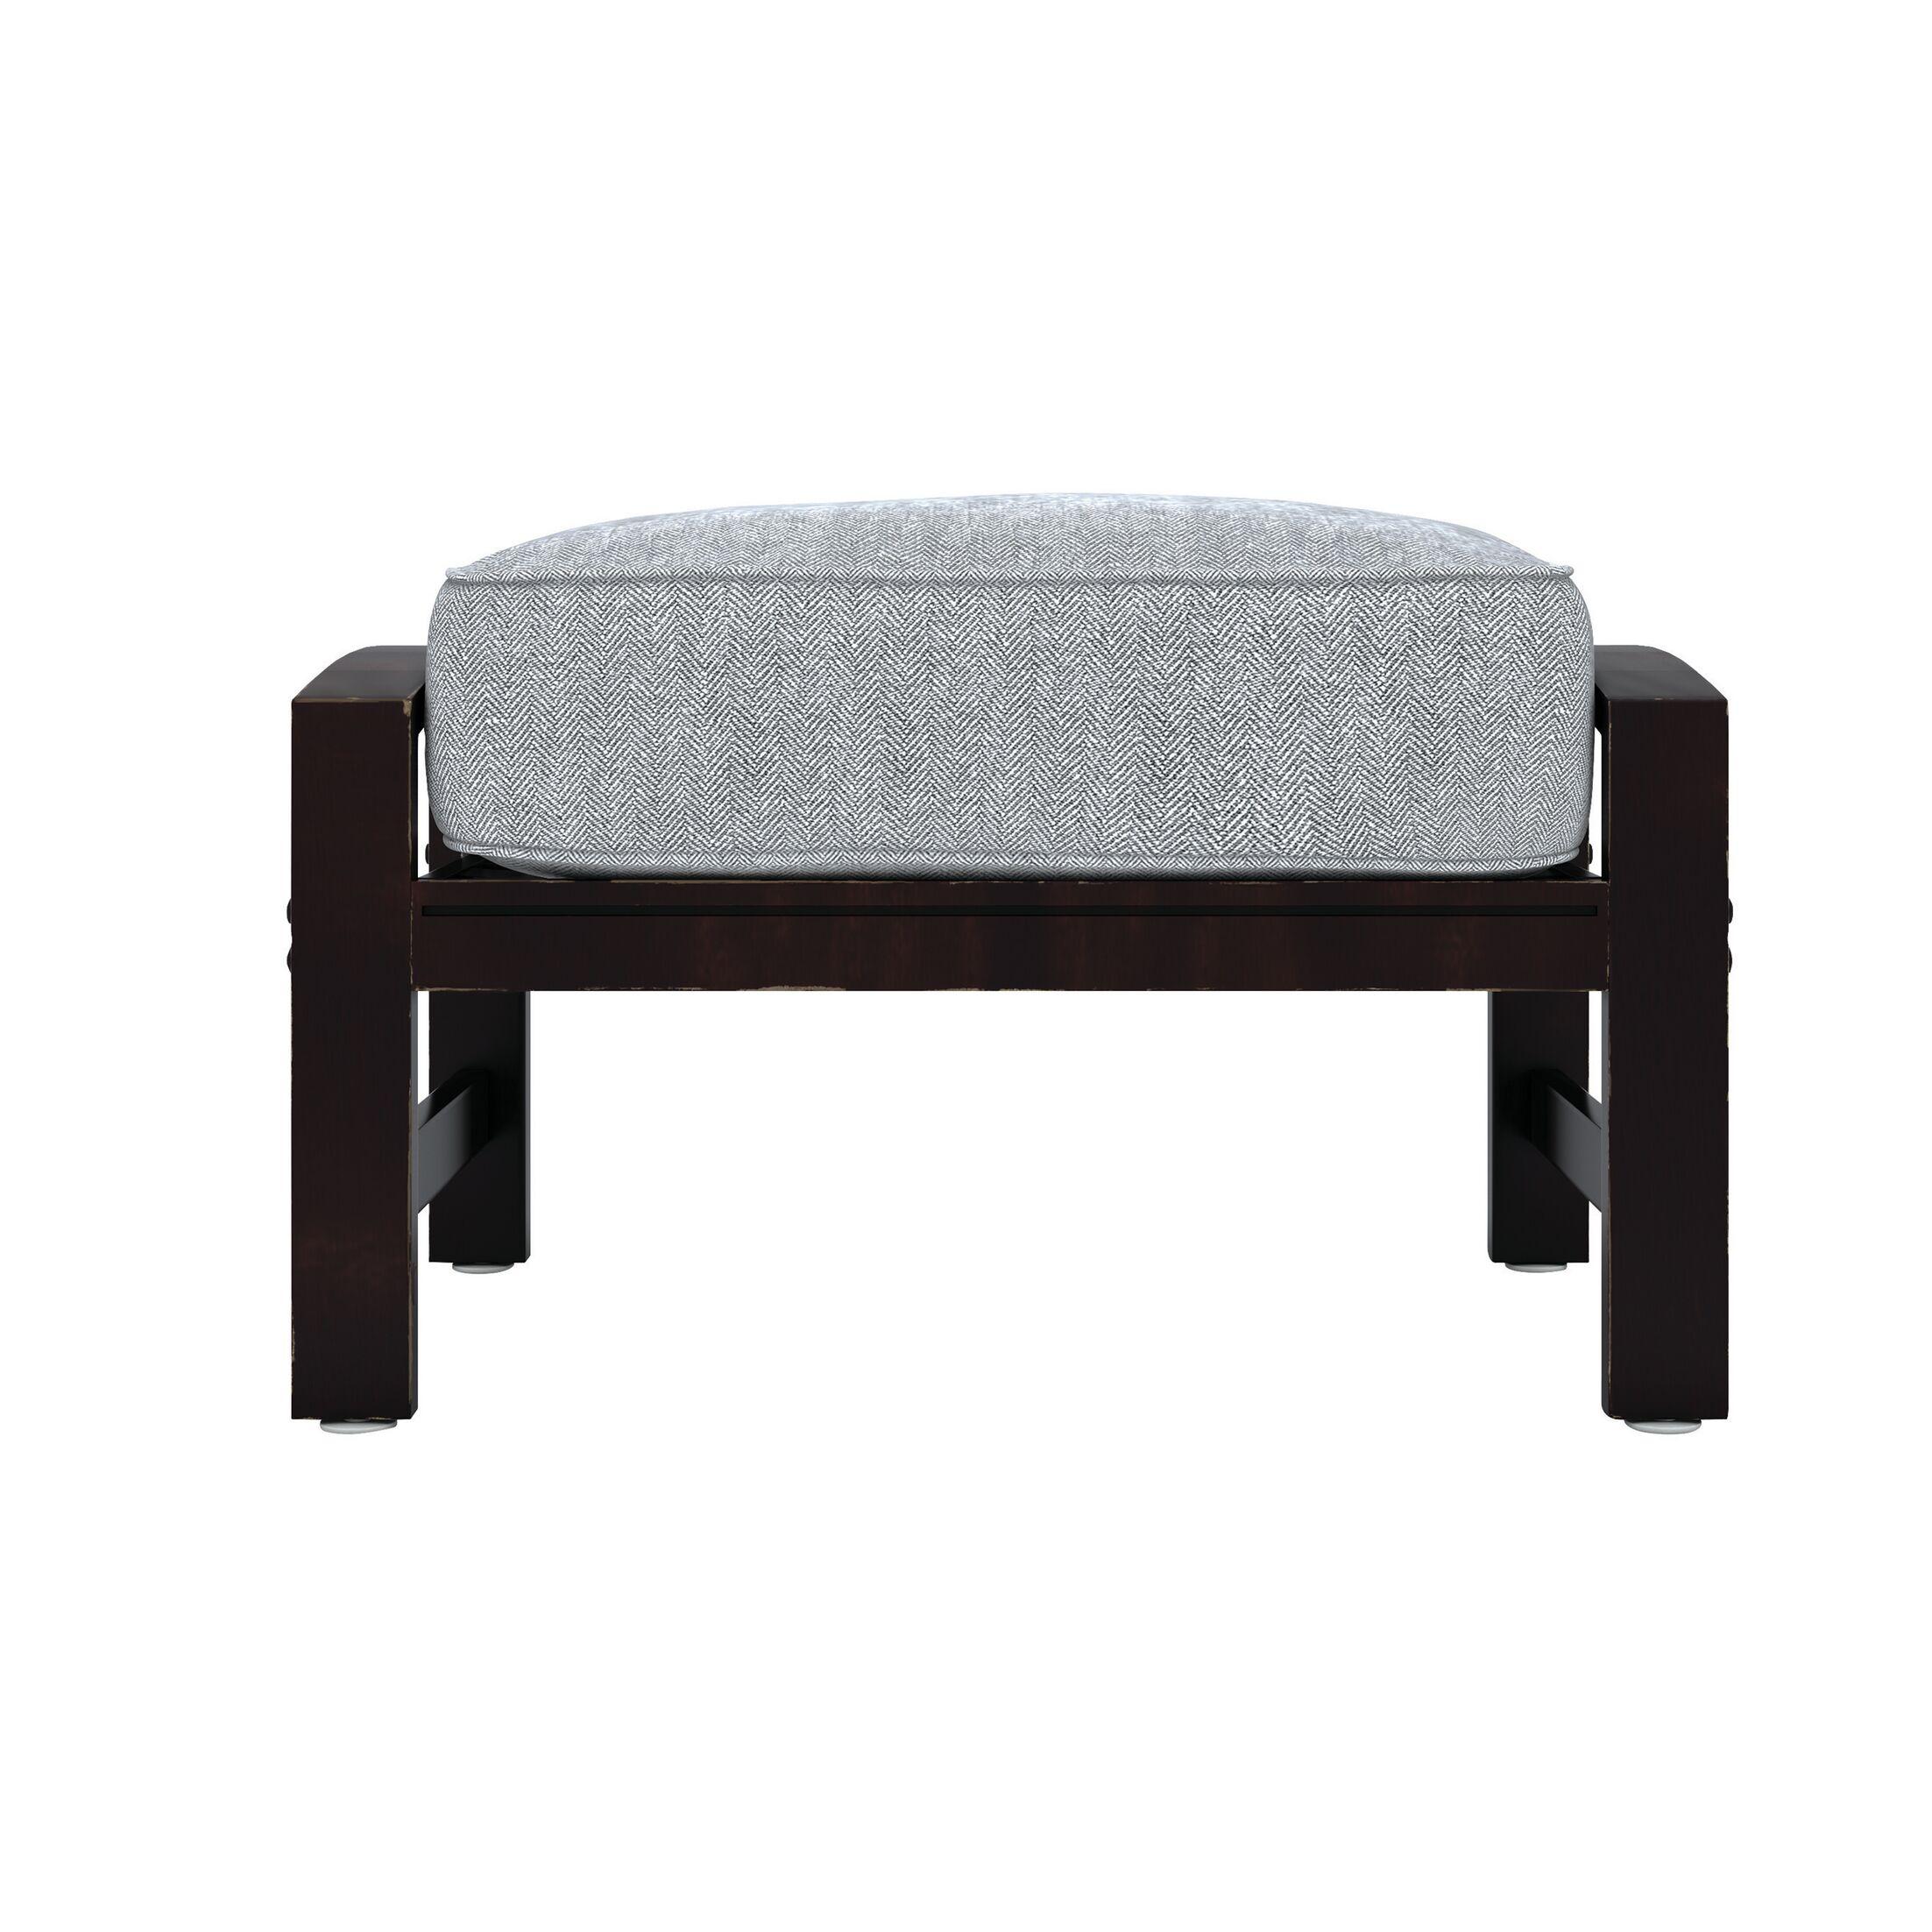 Luedtke Ottoman with Cushion